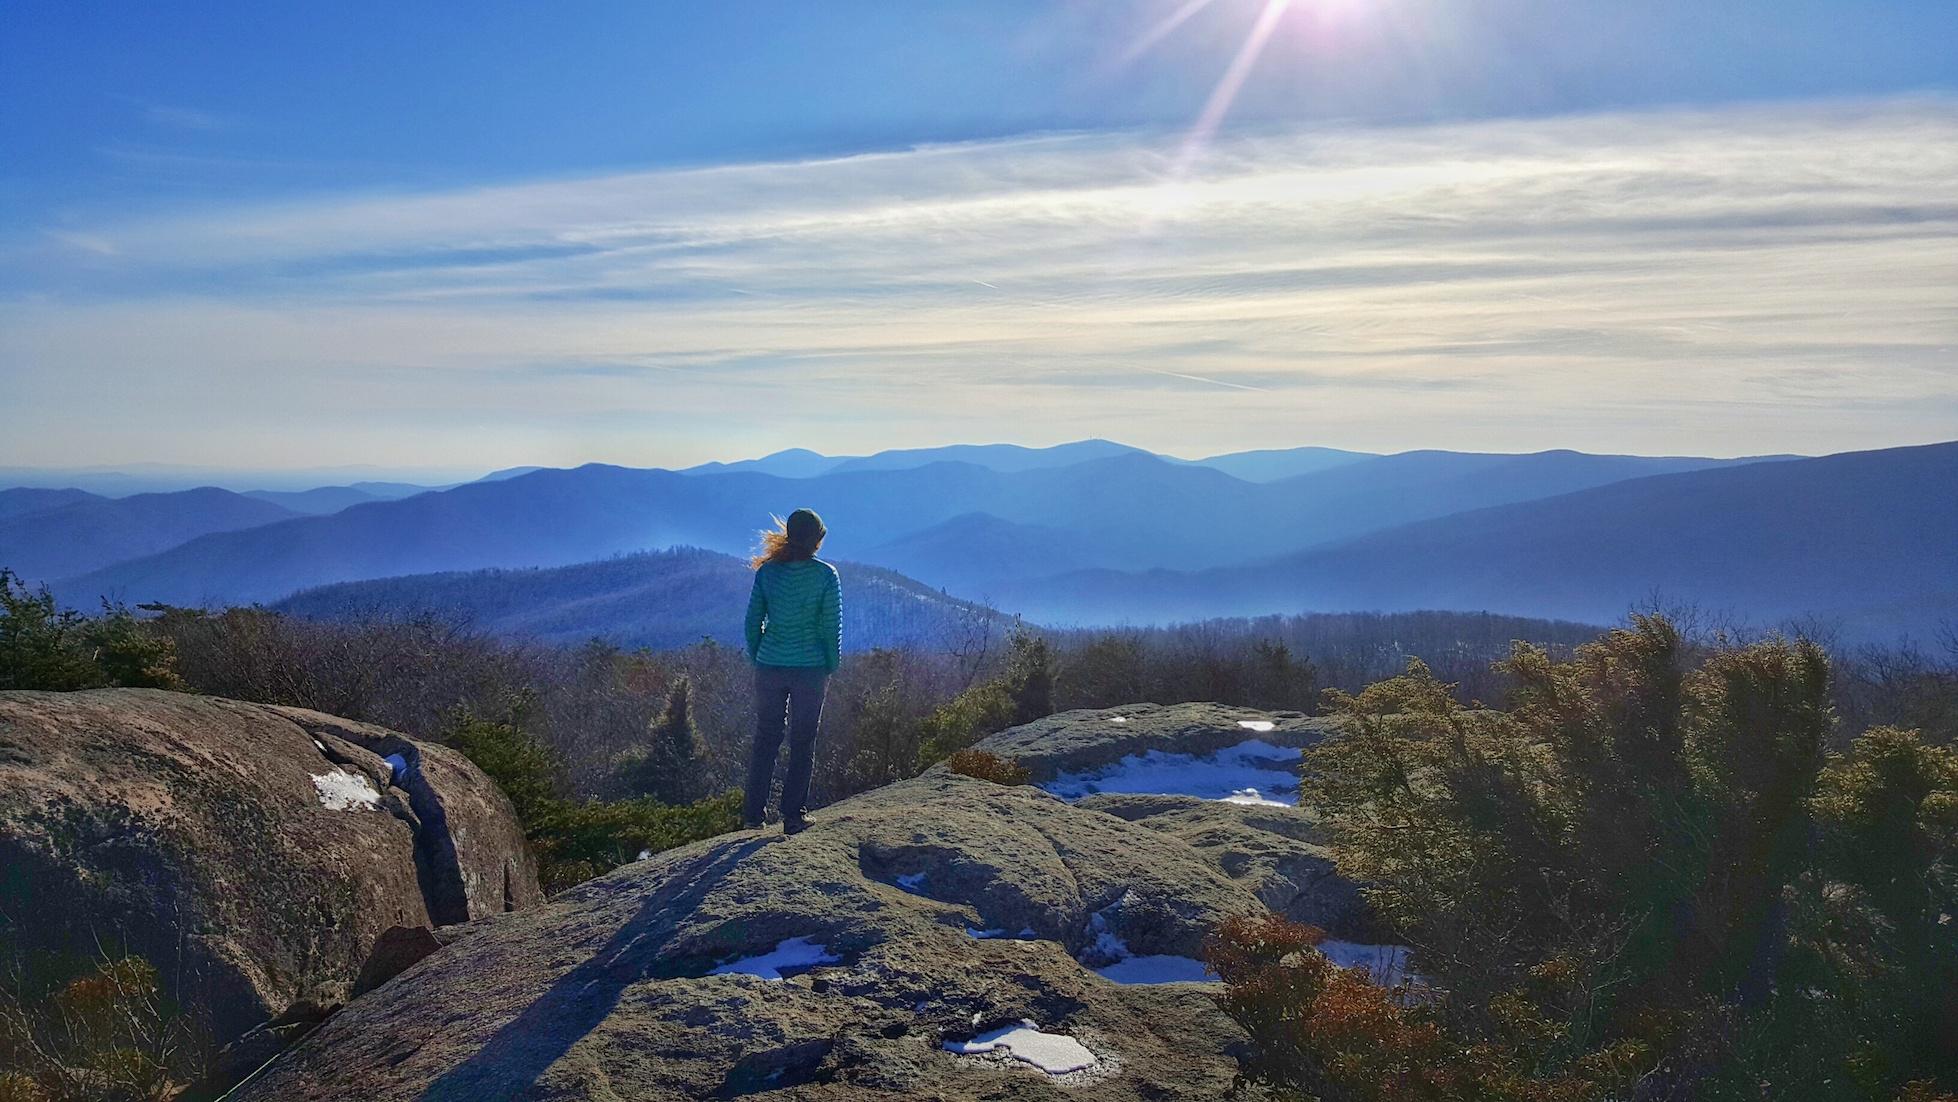 Shenandoah Drive and Hiking Old Rag, Shenandoah National Park, Virginia